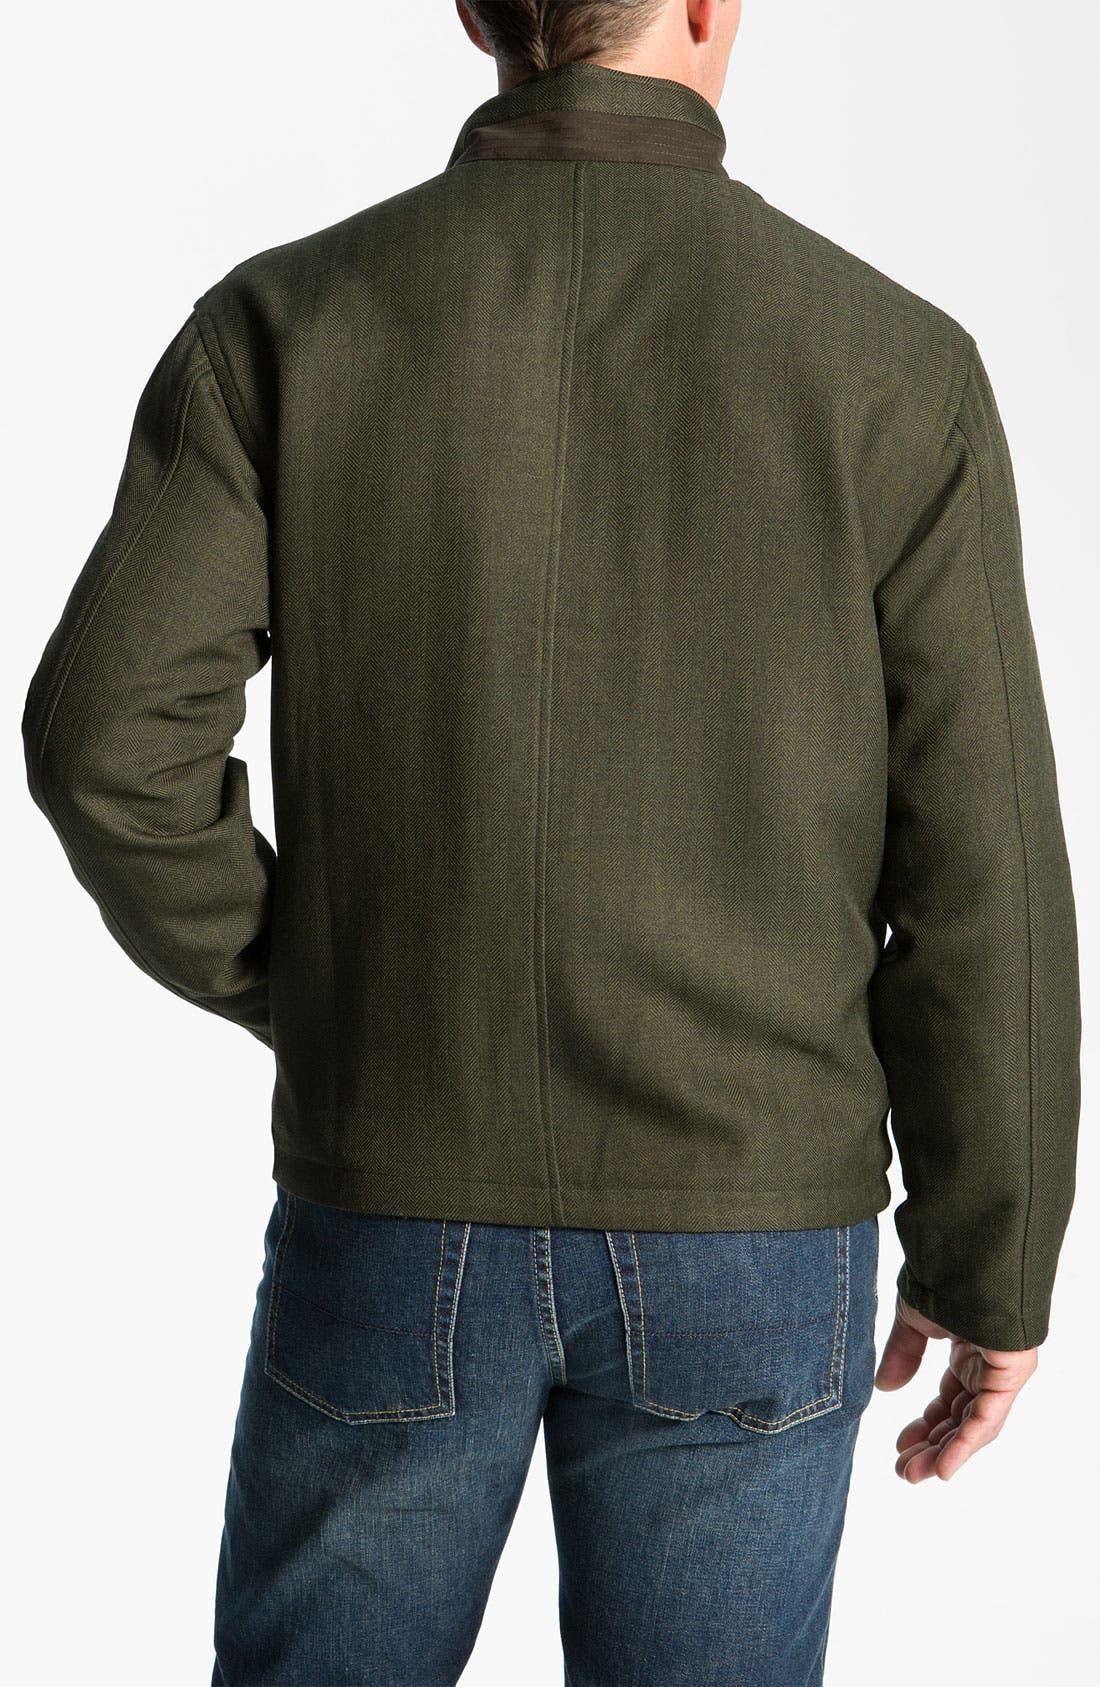 Alternate Image 2  - Cutter & Buck 'Weathertec Bearsden' Reversible Jacket (Big & Tall)